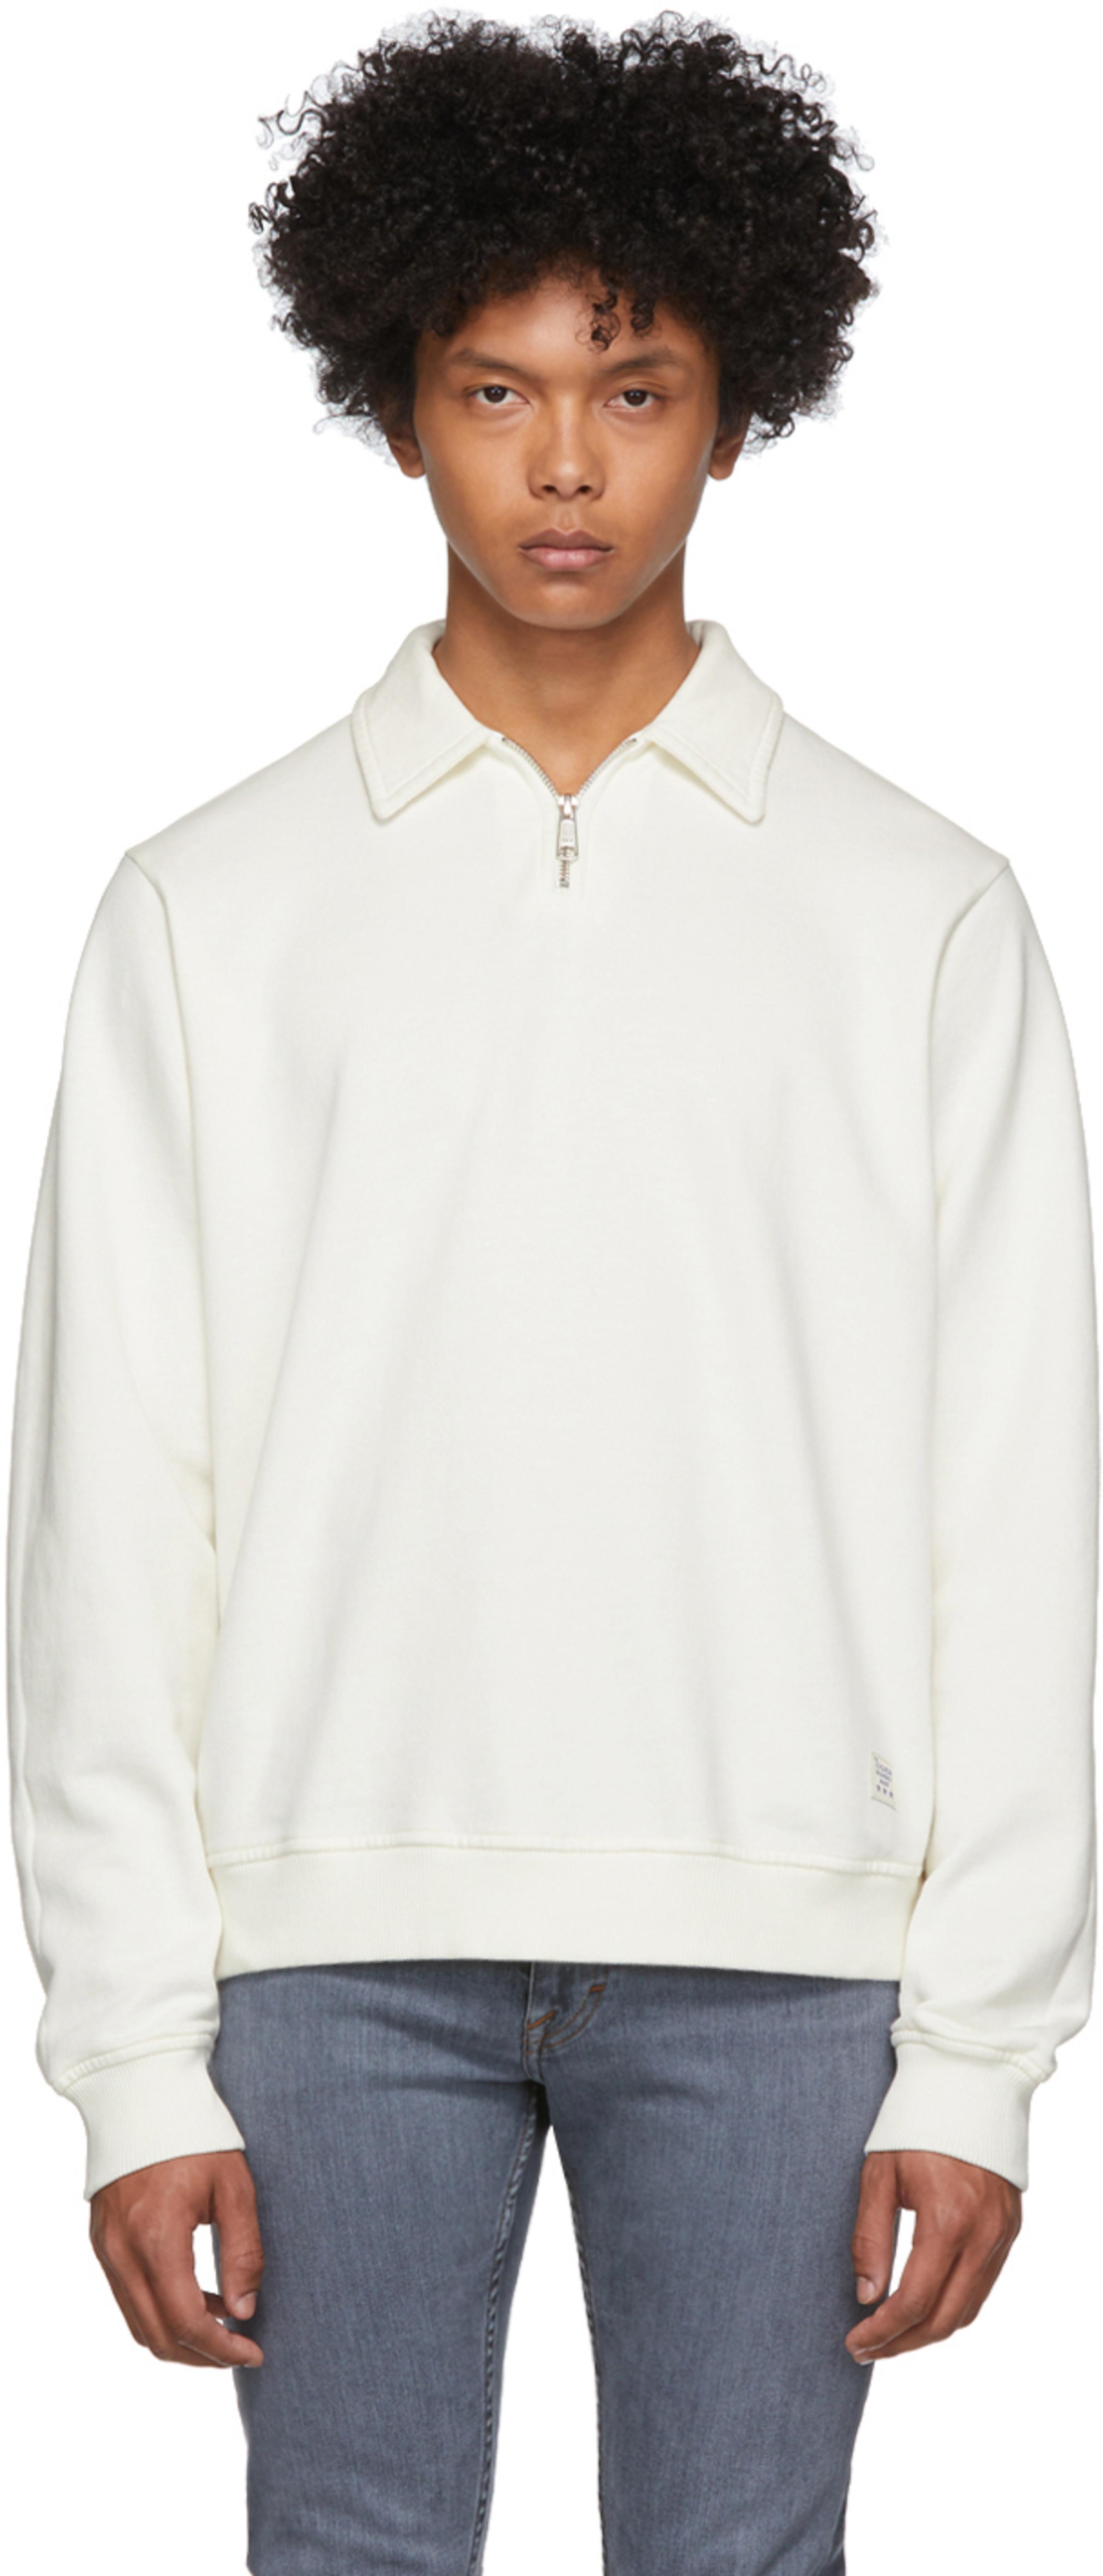 c73909e46 Off-White Ocean Sweatshirt